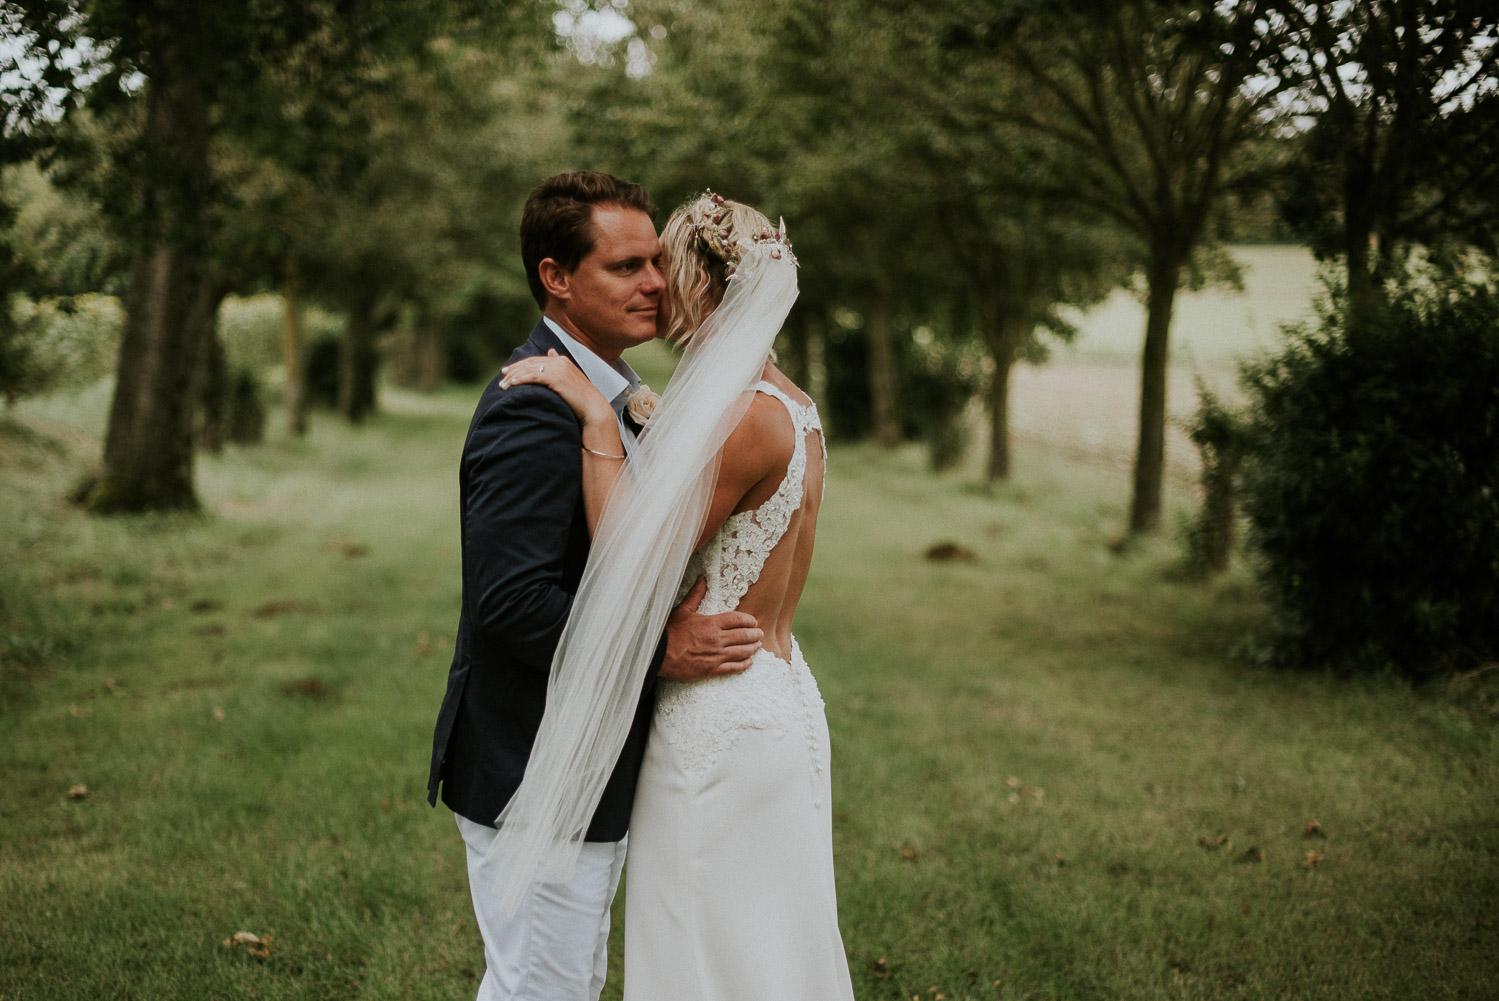 chateau_la_commanderie_mirepoix__wedding_katy_webb_photography_france_UK129